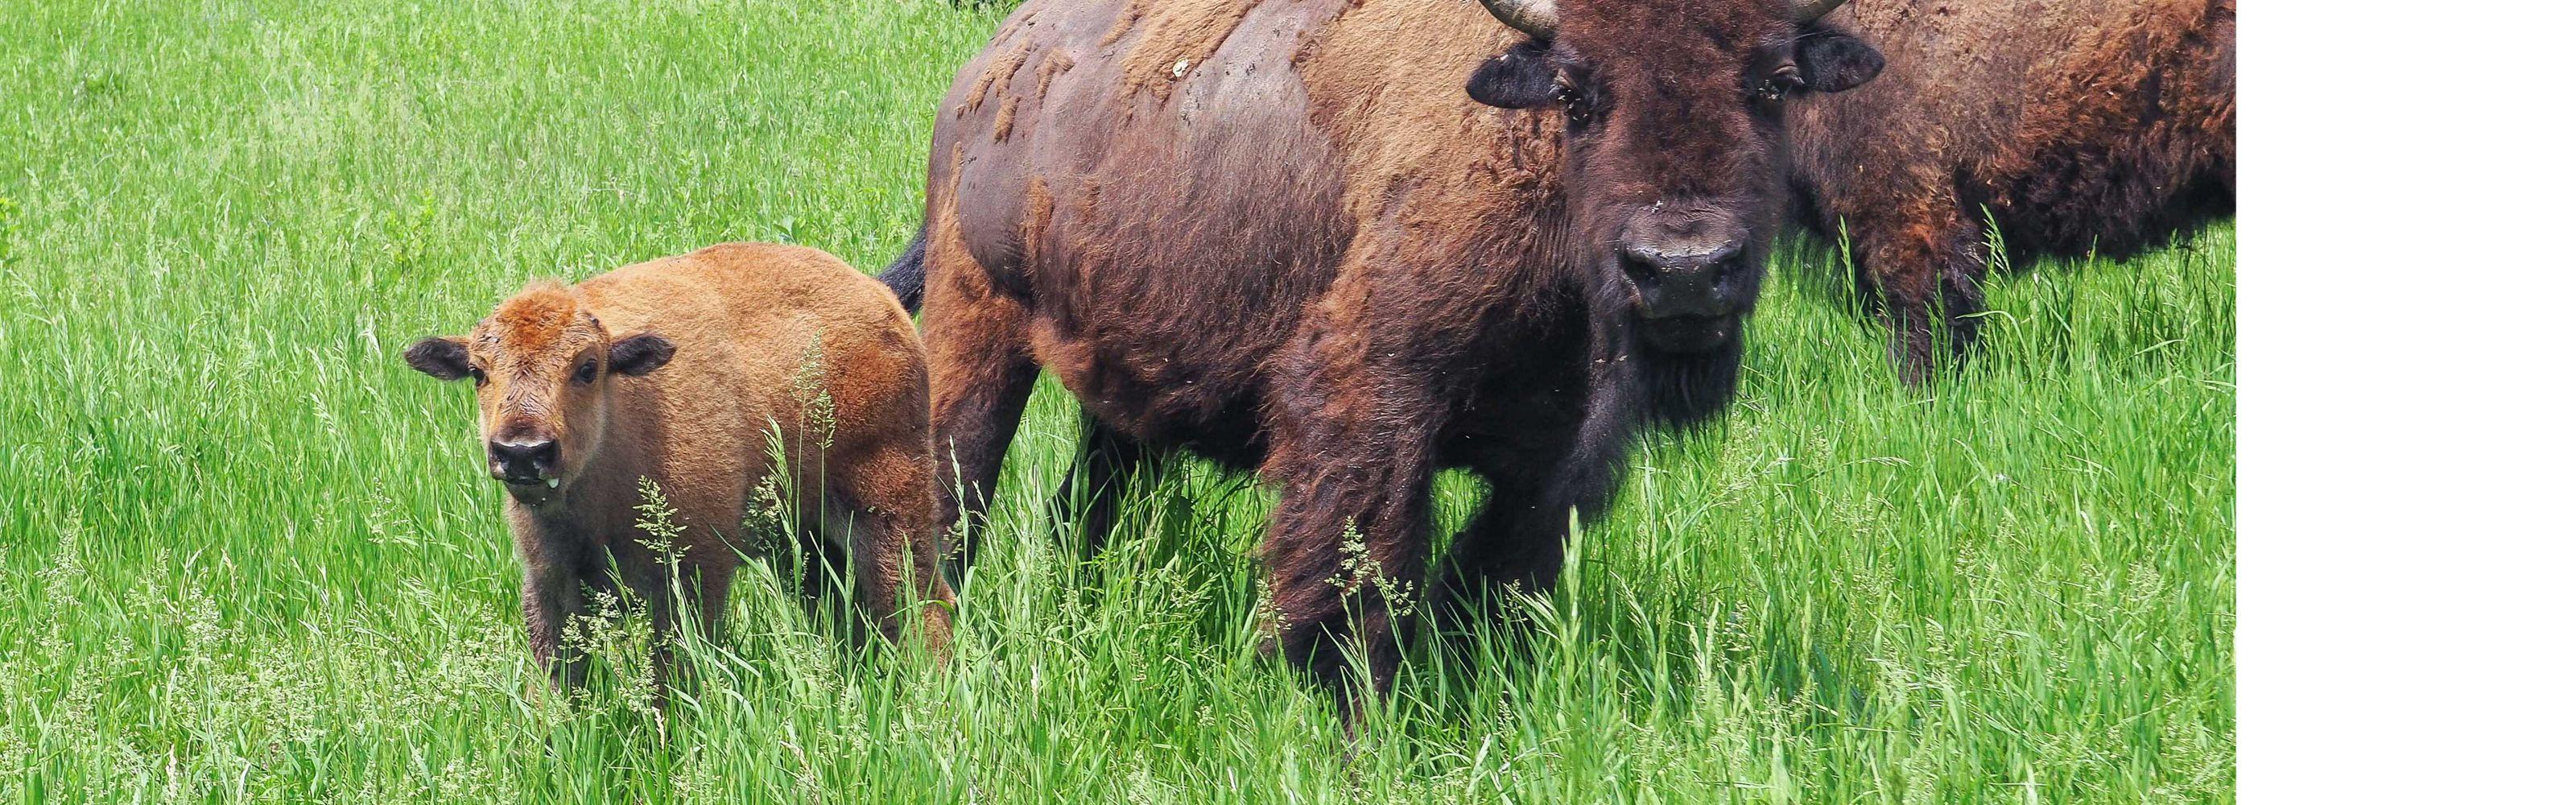 on Broken Kettle Grasslands Preserve in the Loess Hills of Western Iowa.